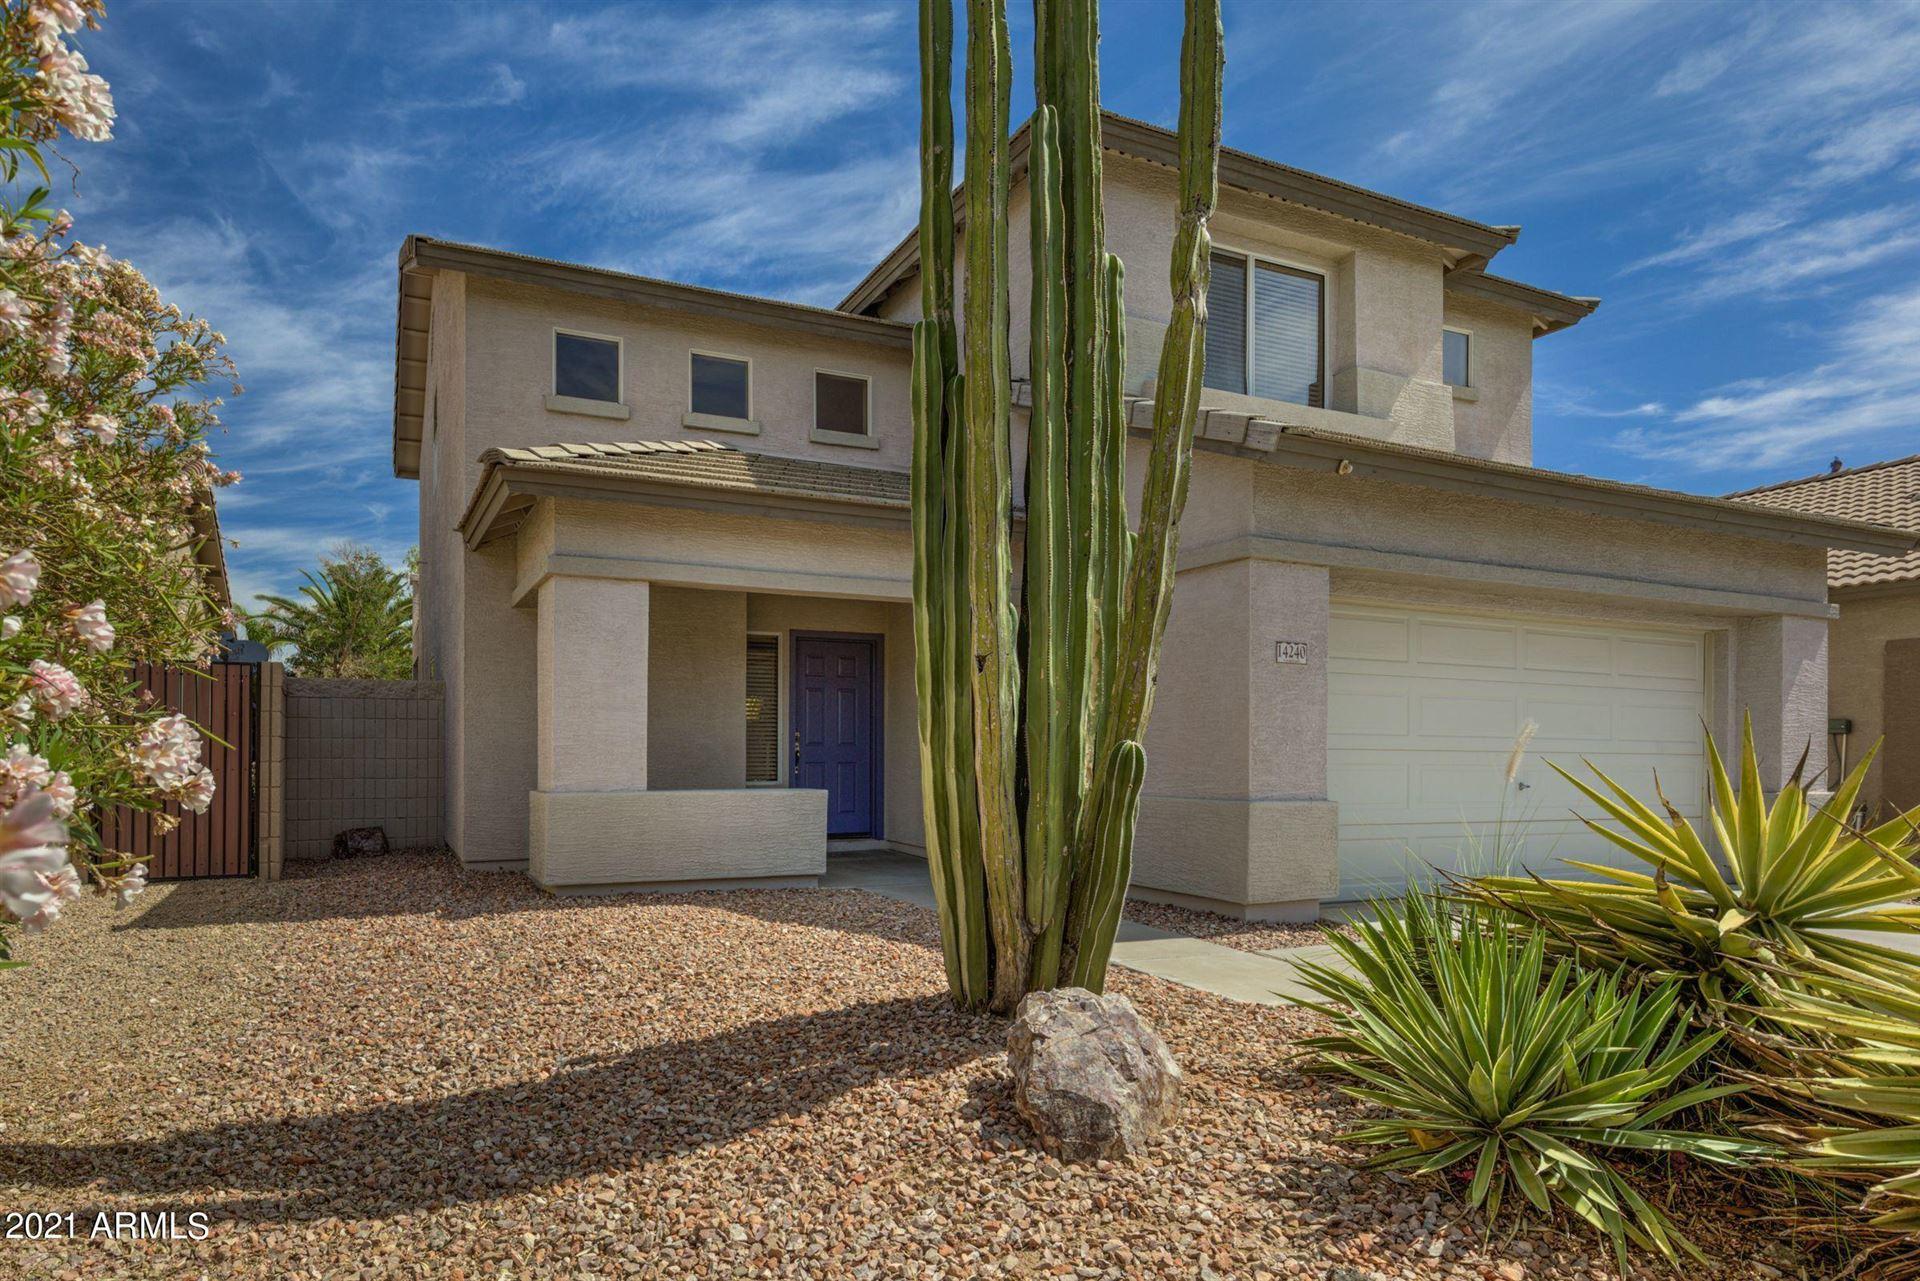 Photo of 14240 W CLARENDON Avenue, Goodyear, AZ 85395 (MLS # 6249859)